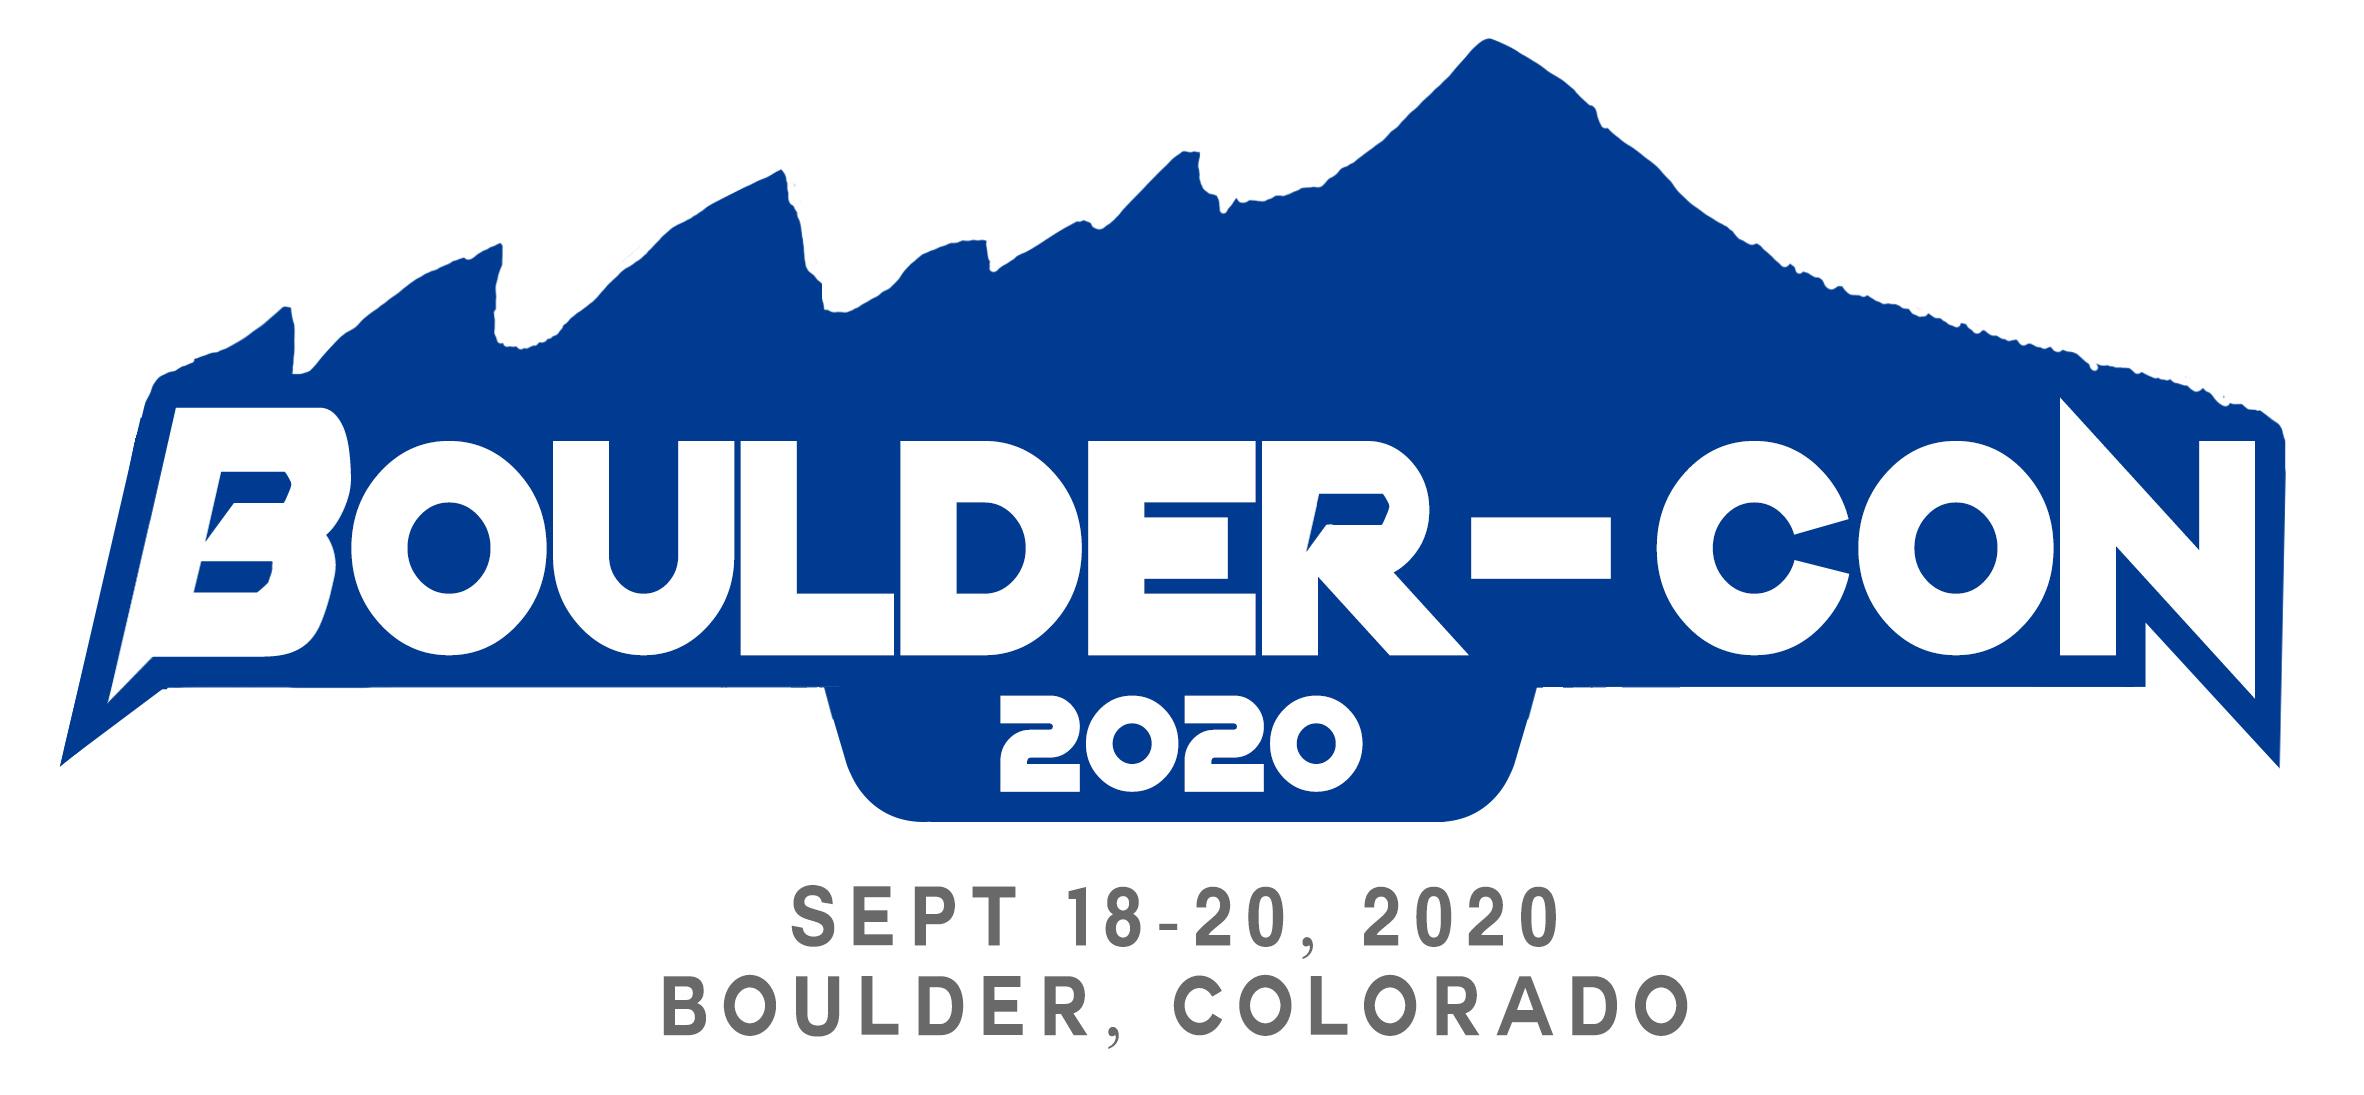 Boulder-Con_Logo_DRAFT.jpg